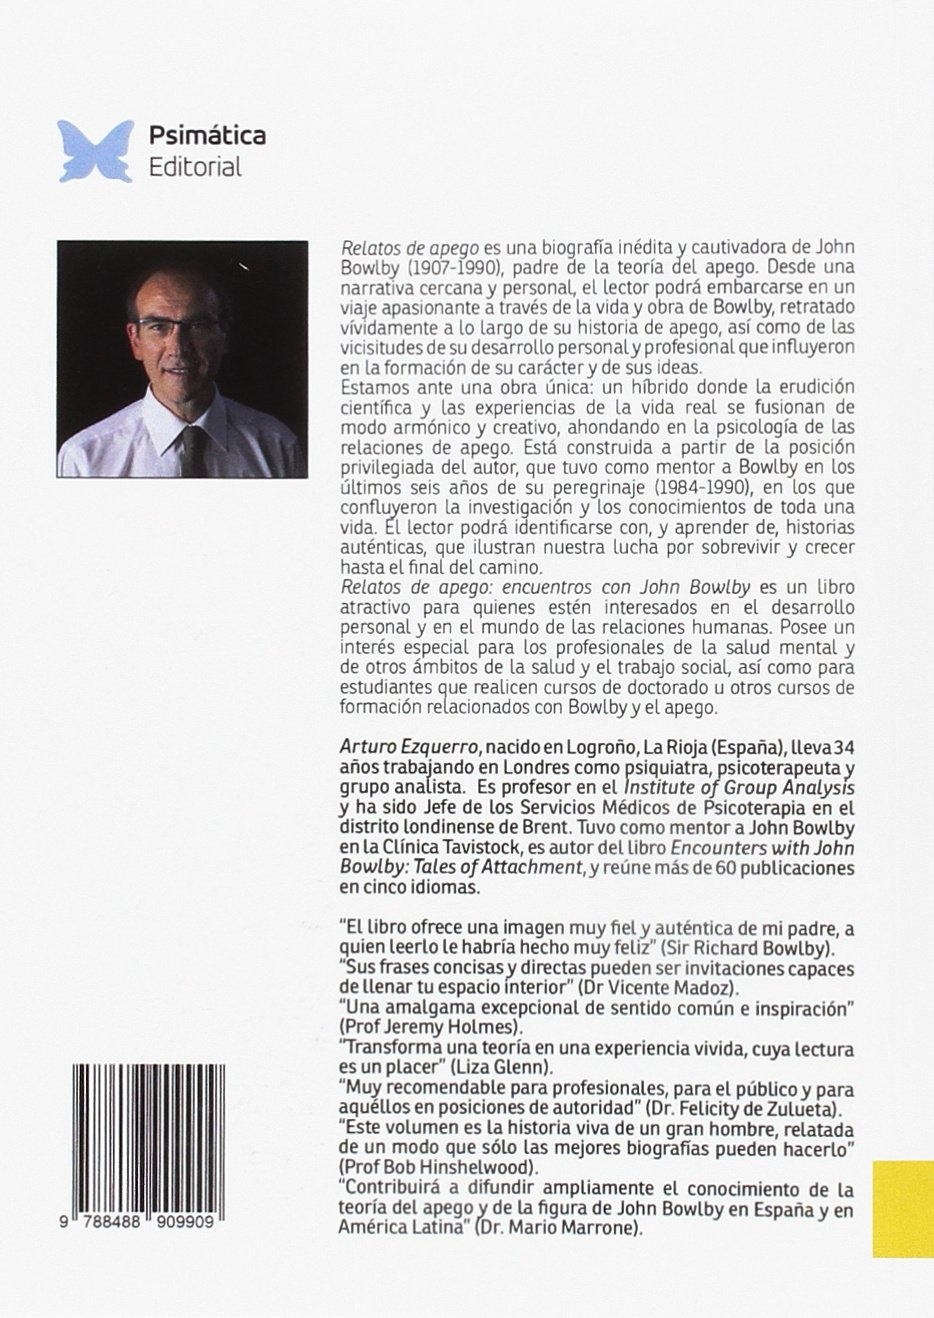 Amazon.com: Relatos de apego : encuentros con John Bowlby ...